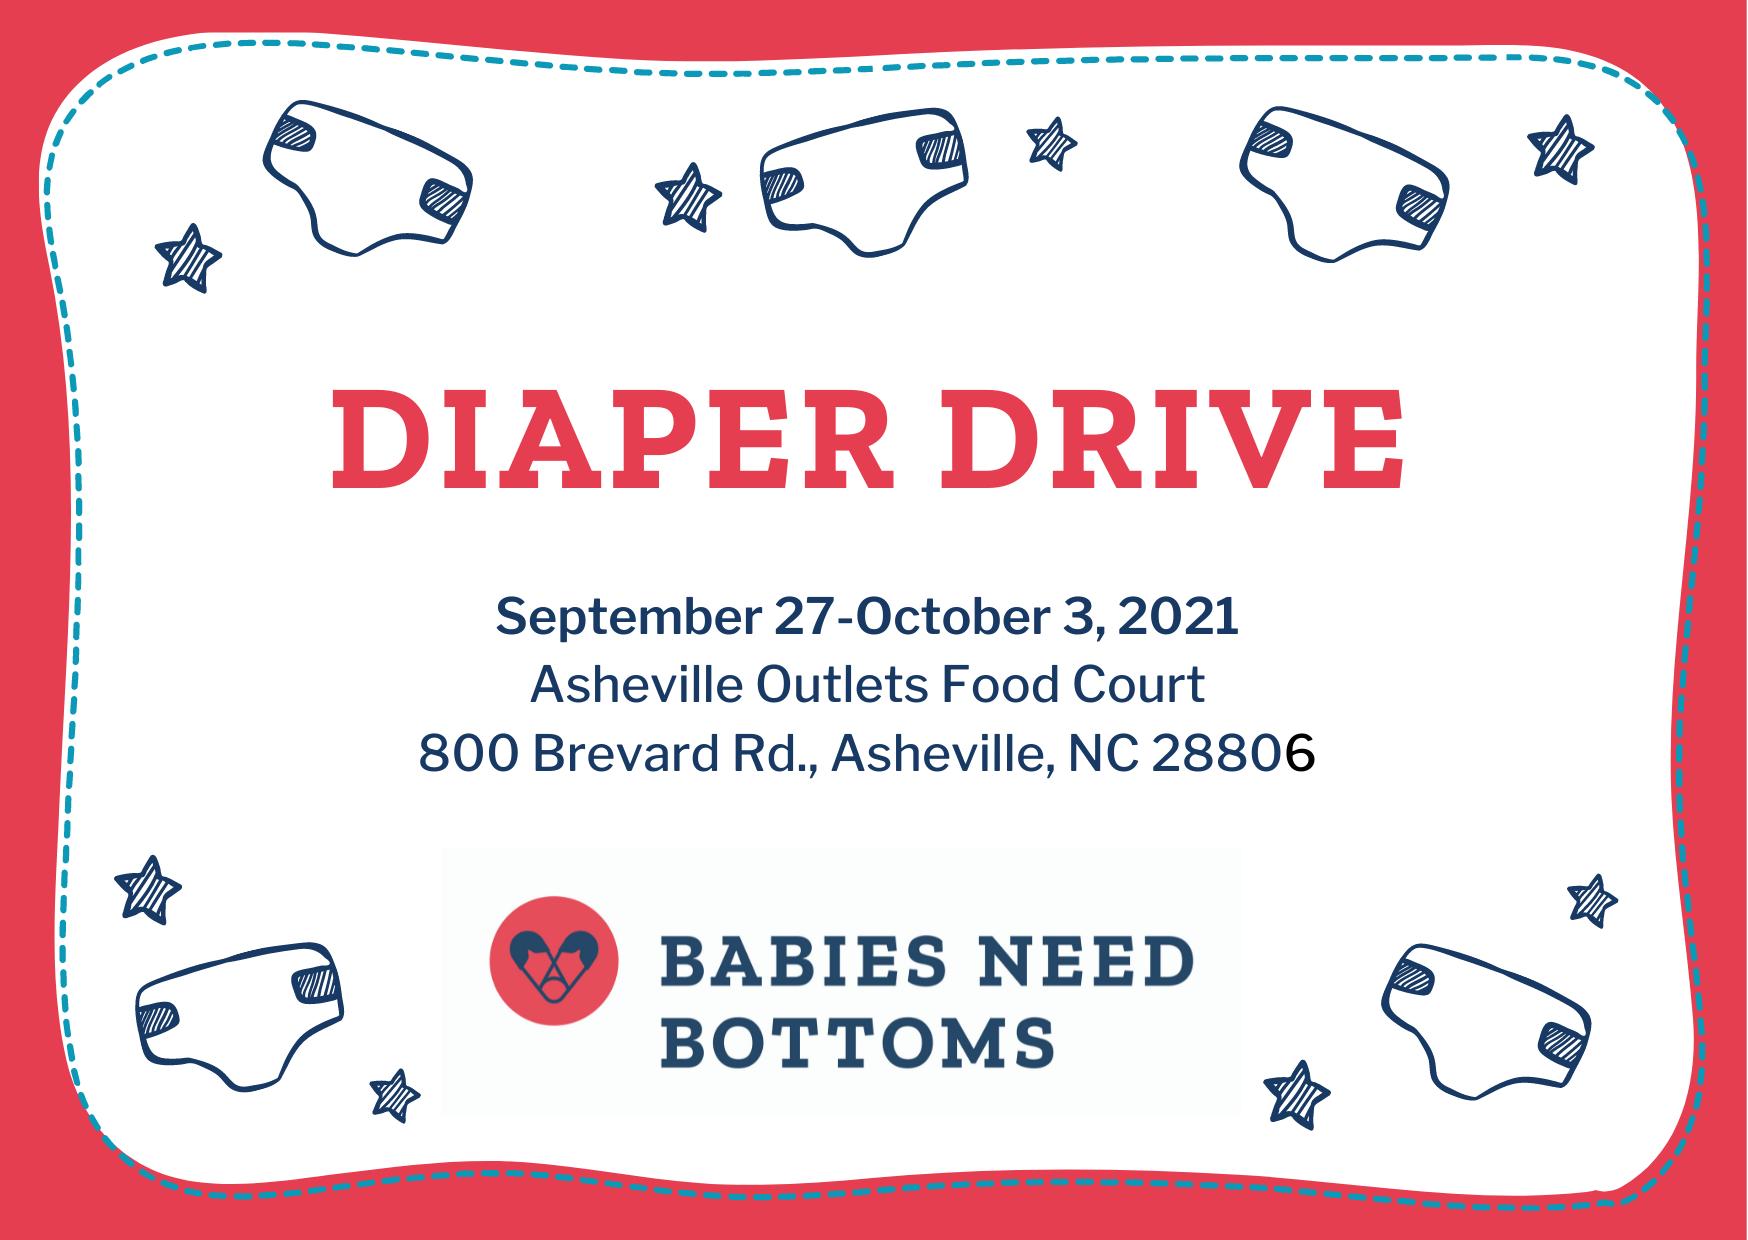 Diaper Drive Announcement